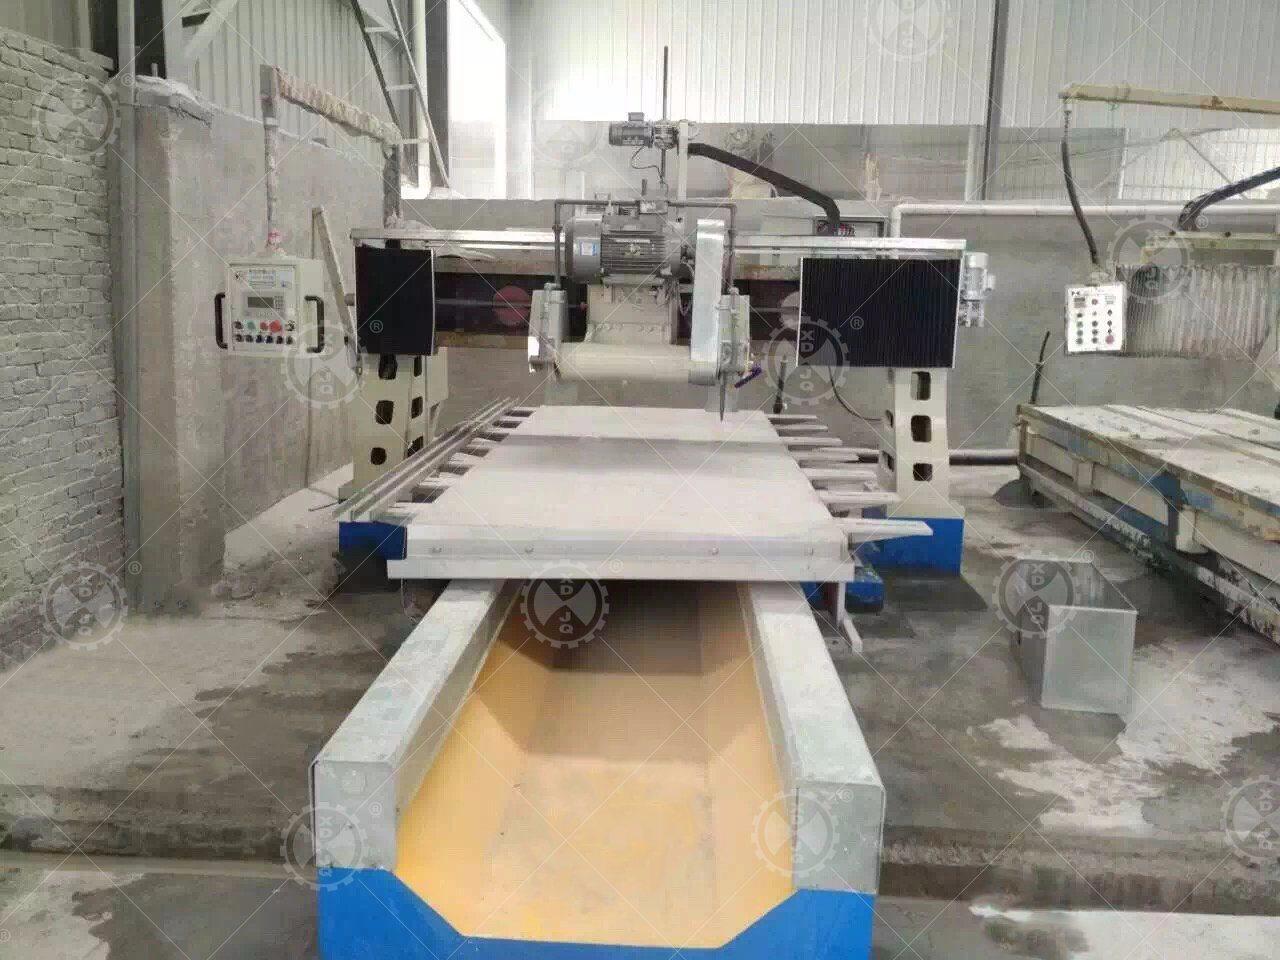 Cnfx-1800 Automatic CNC Stone Profiling Processing Machine